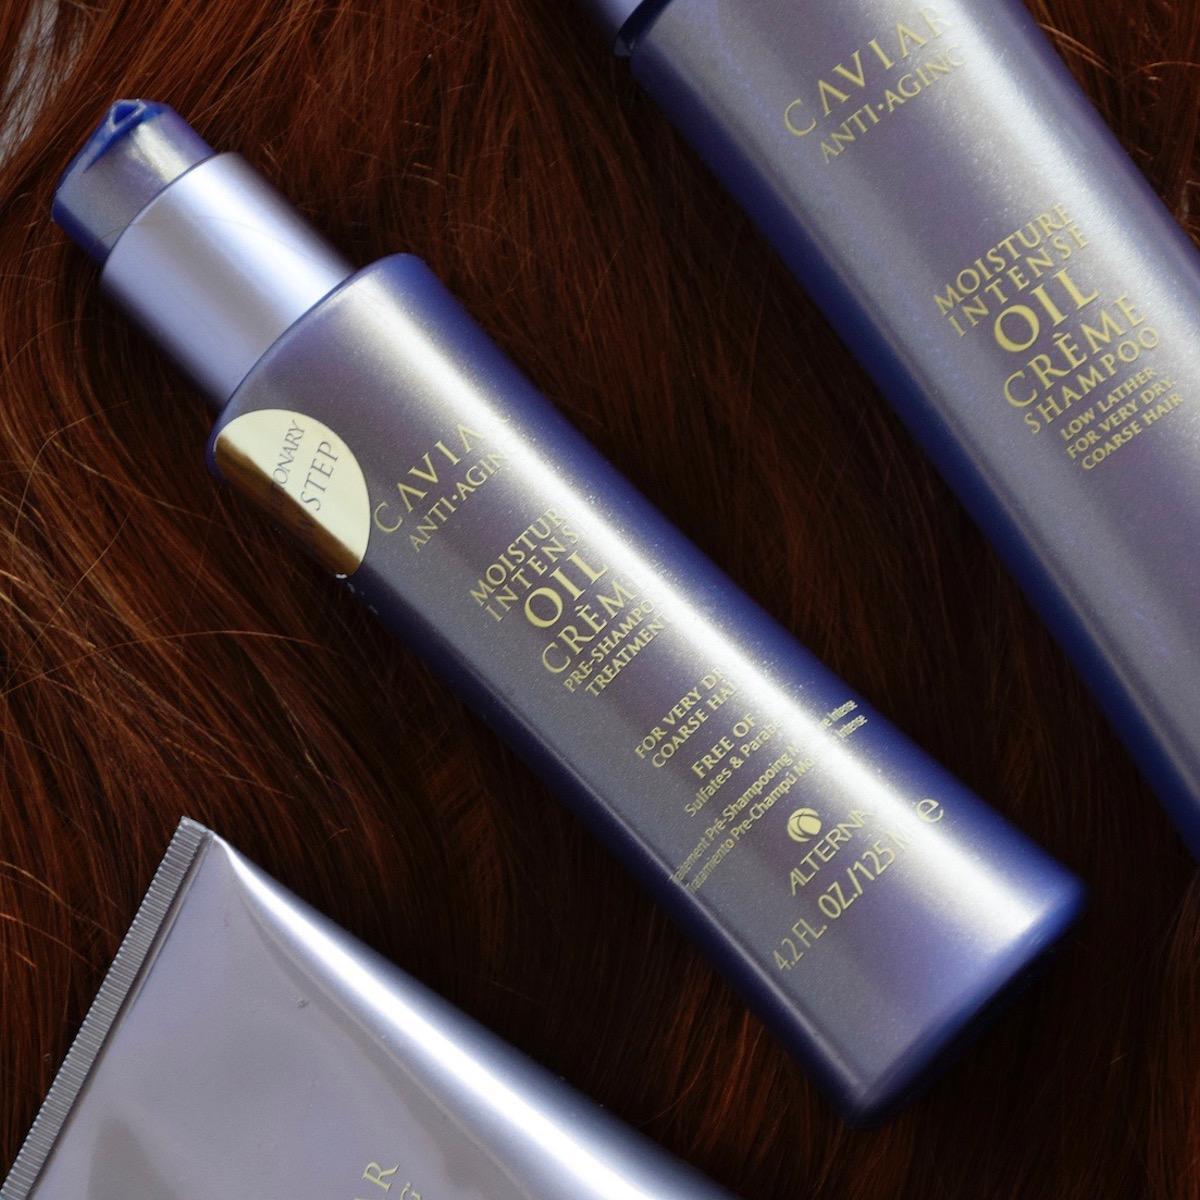 Za suhe lase Alterna Caviar Moisture Intense By Beutyfullblog 12